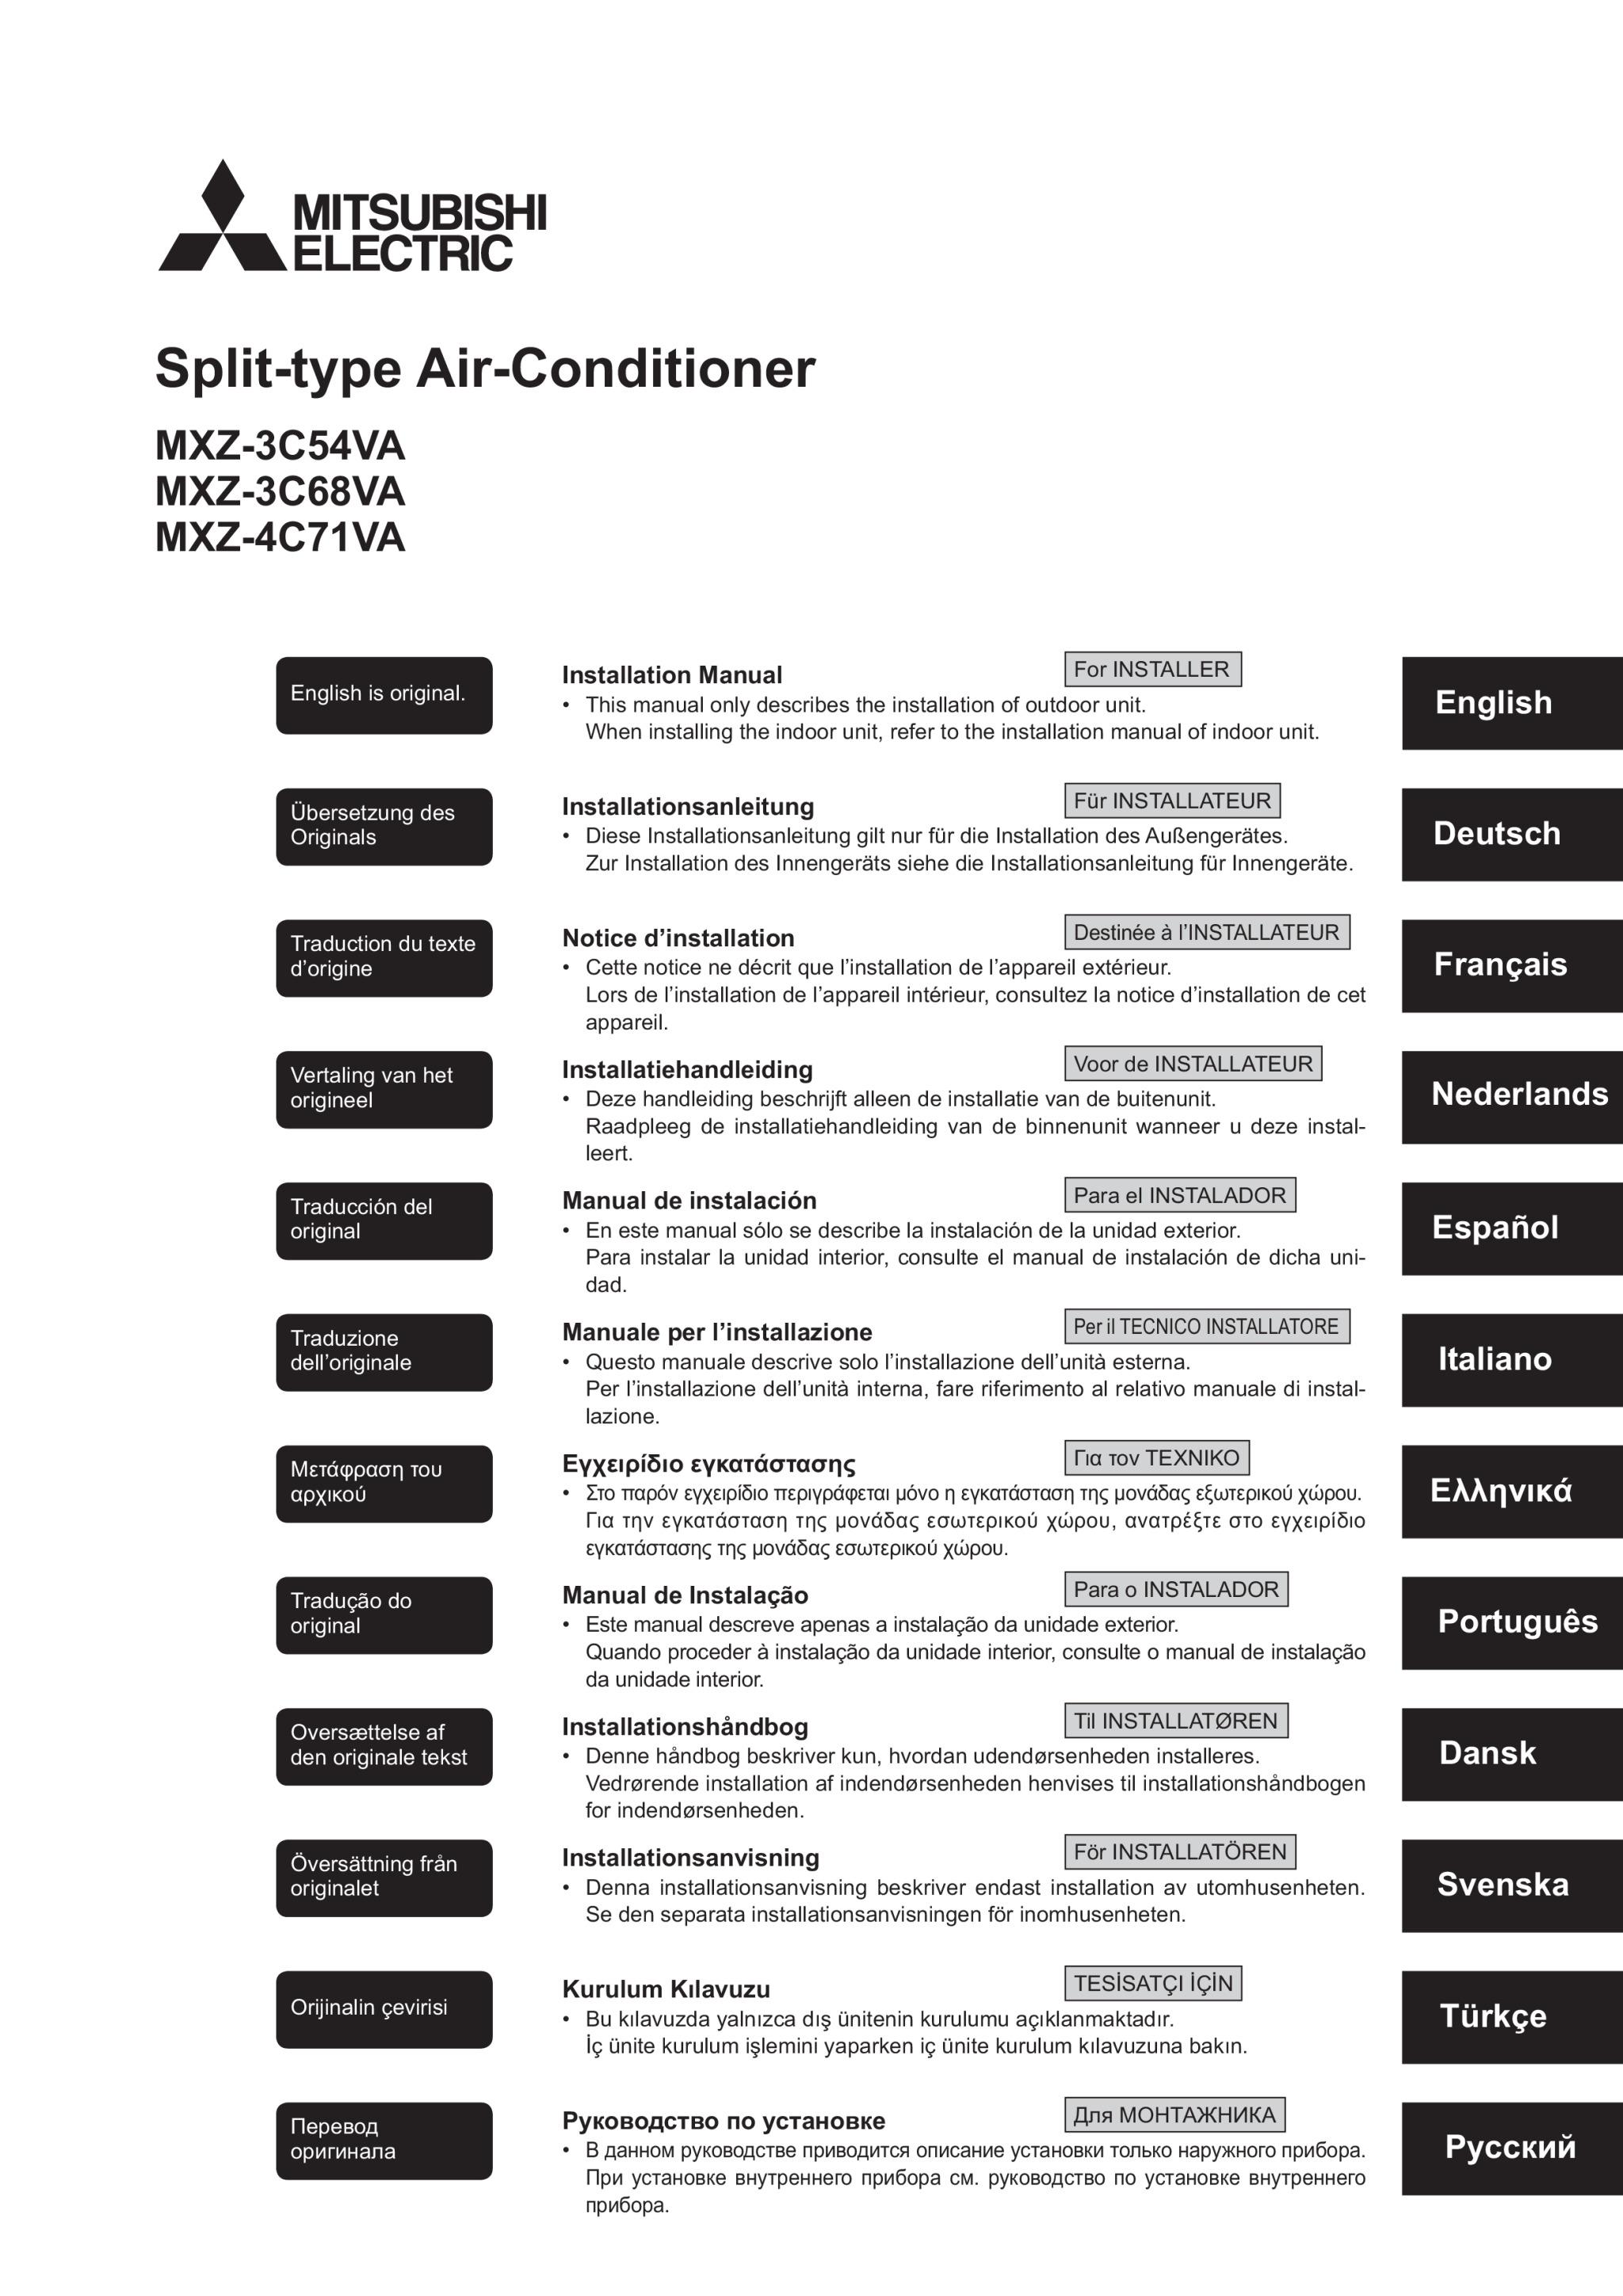 slim mxz installation conditioner pea owners manual air mitsubishi mr